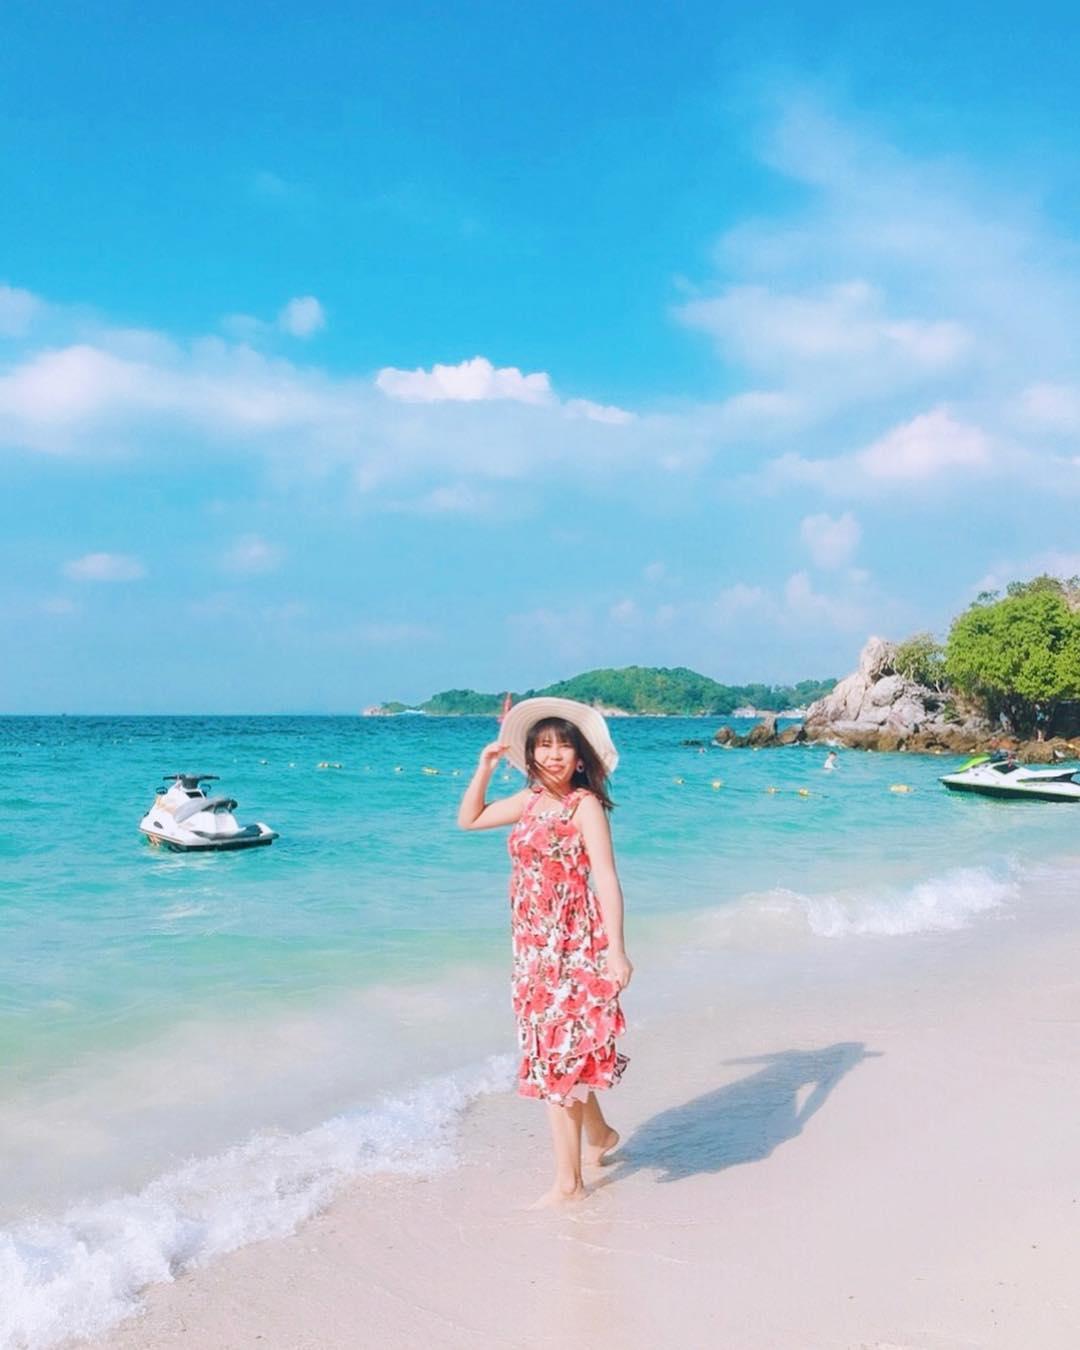 thailan_kinh-nghiem-du-lich-pattaya-10